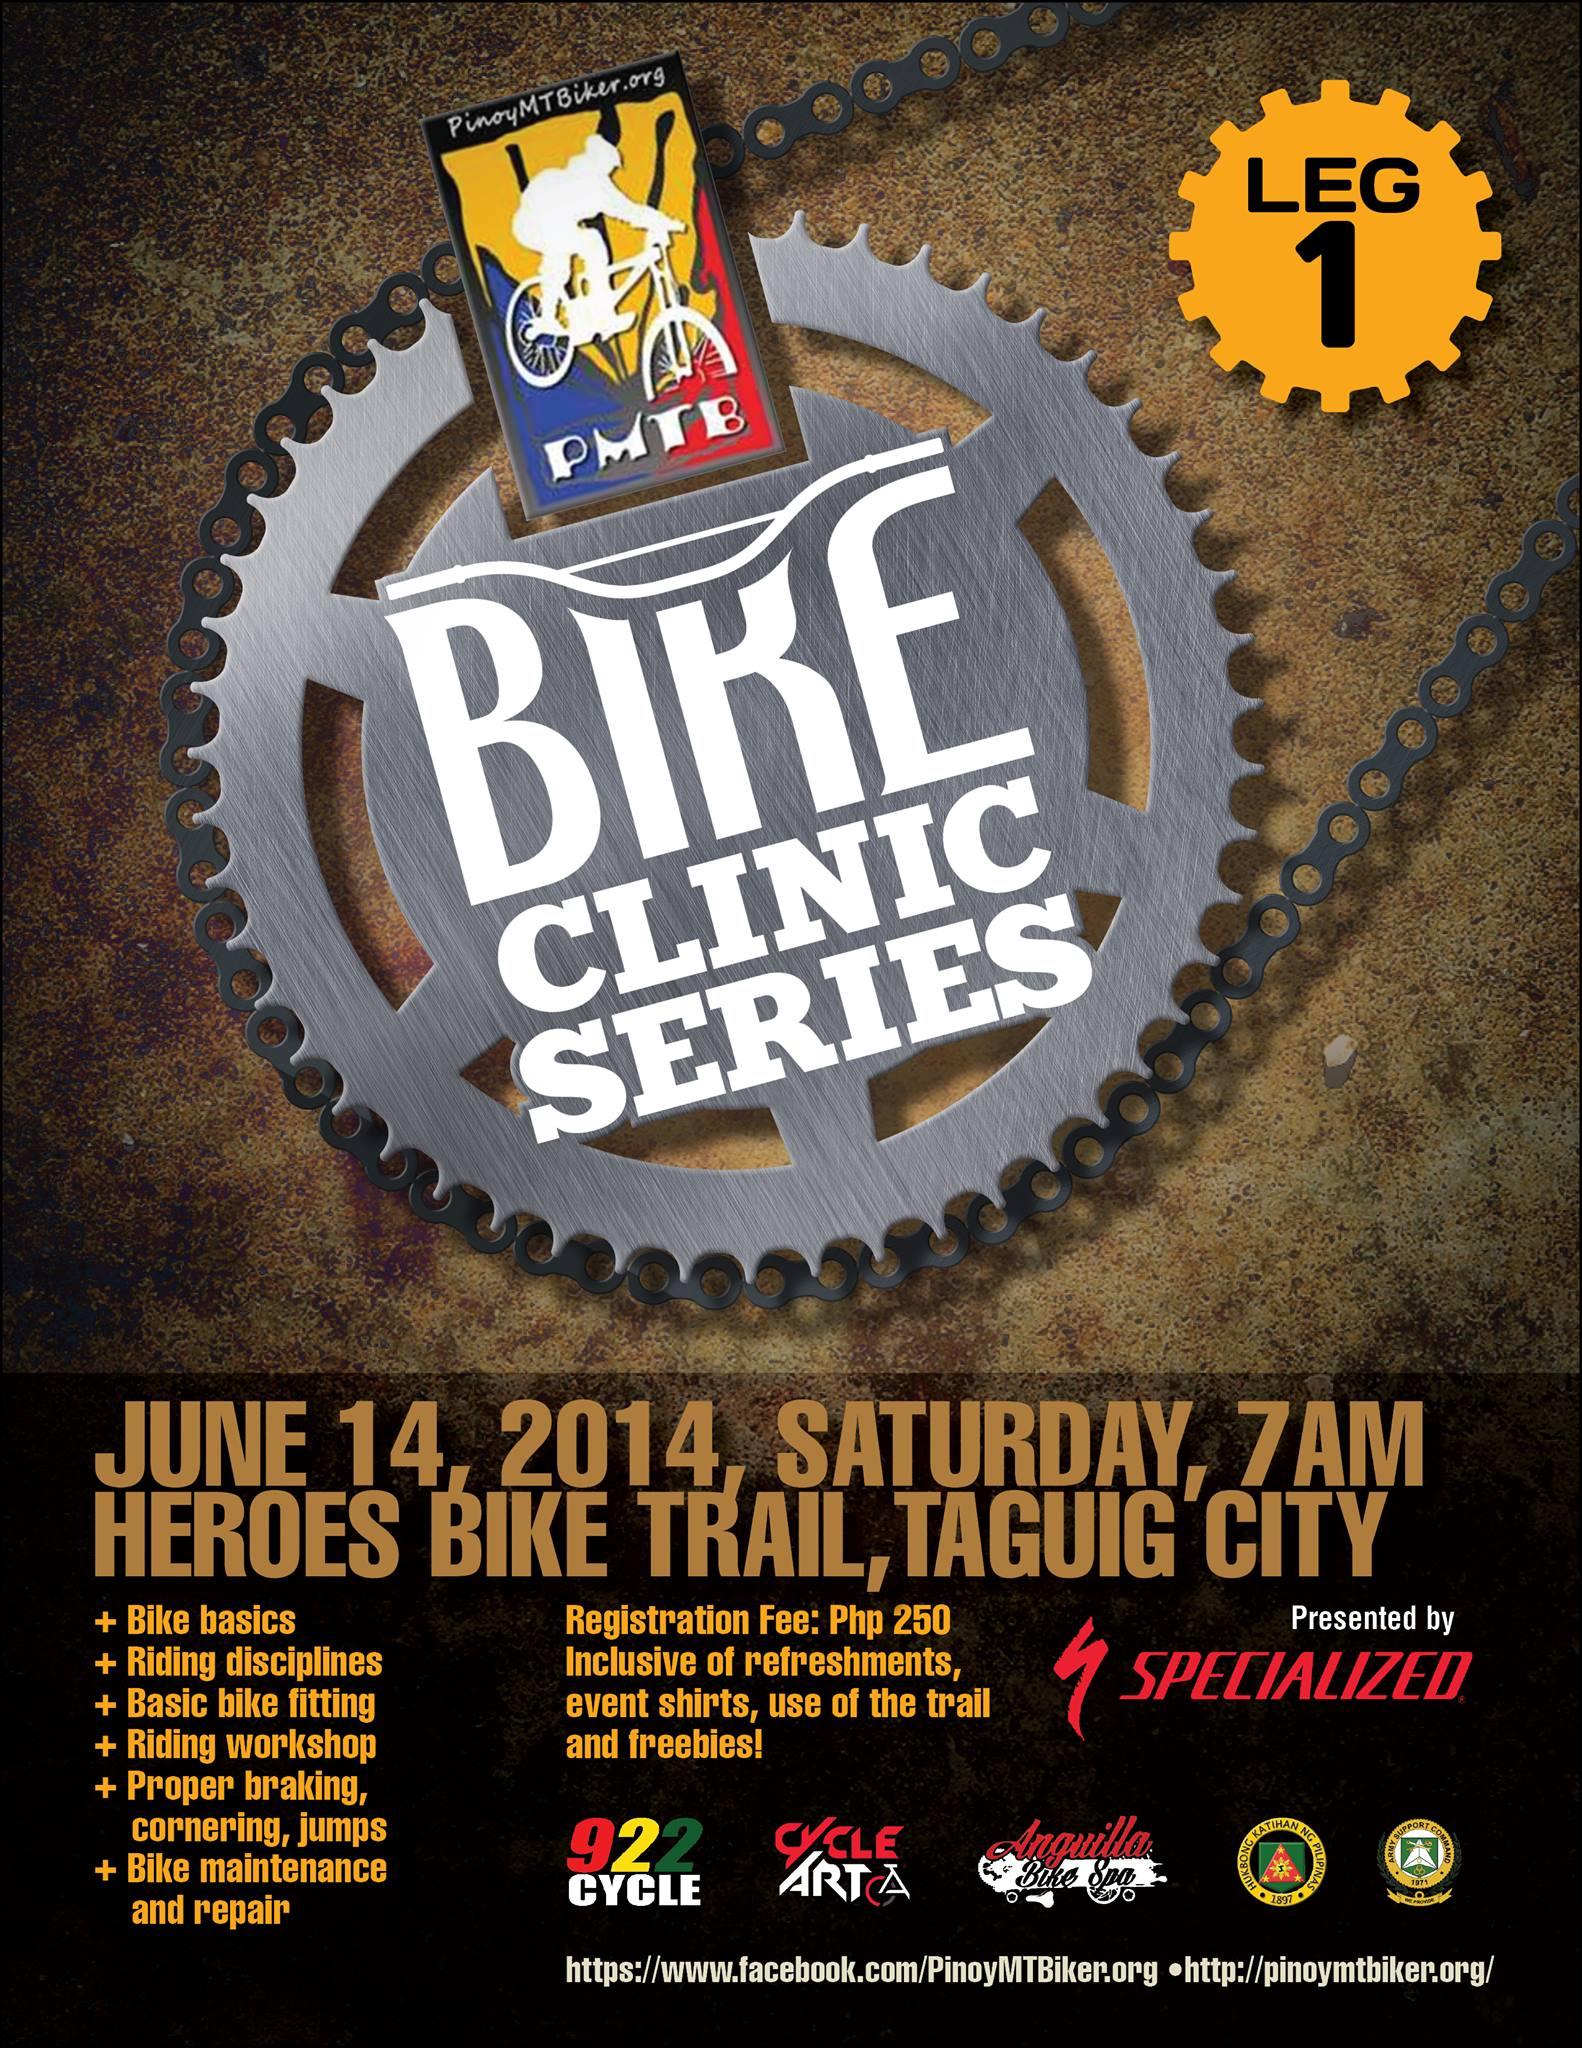 pinoy-mtbiker-bike-clinic-leg1-2014-poster